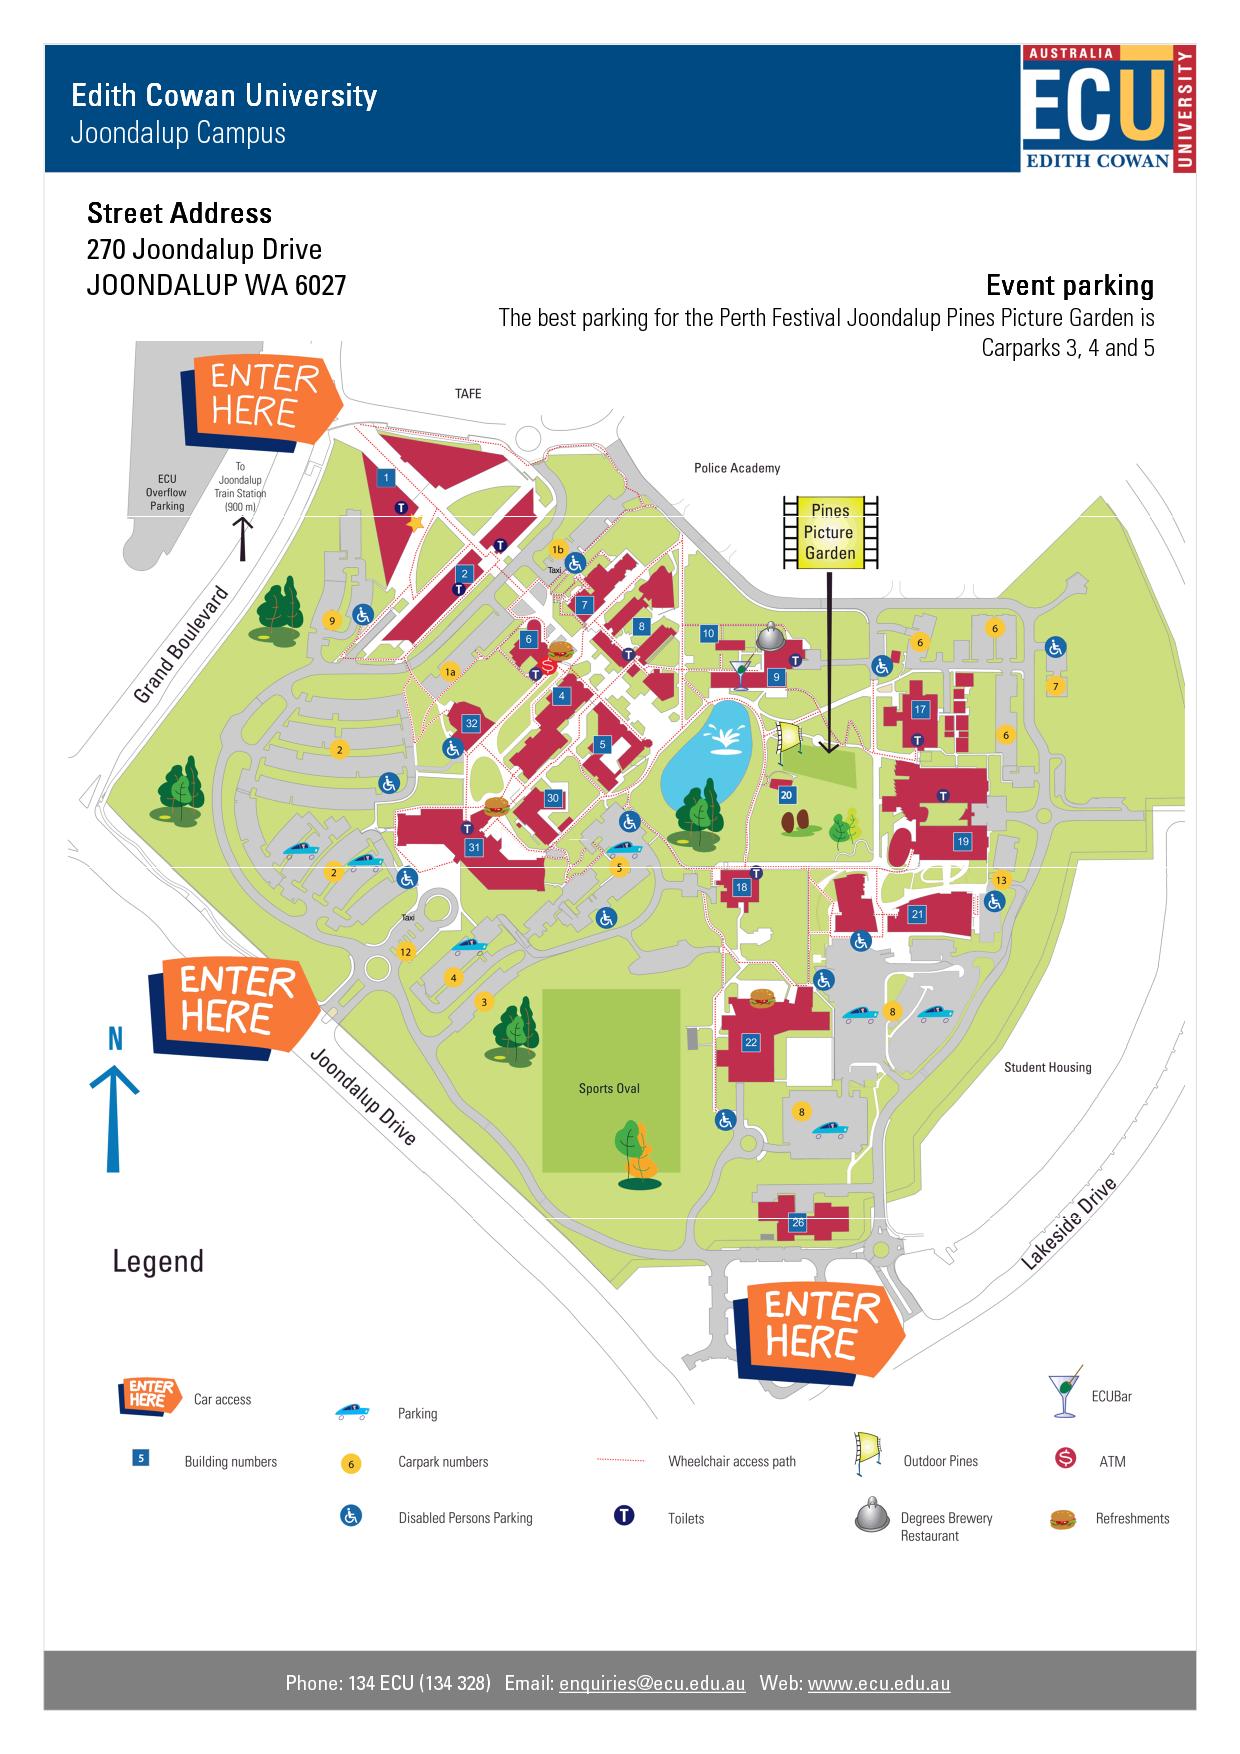 Edithcowanuniversity Ecu Maps Jndlp Joondalup Random Stuff